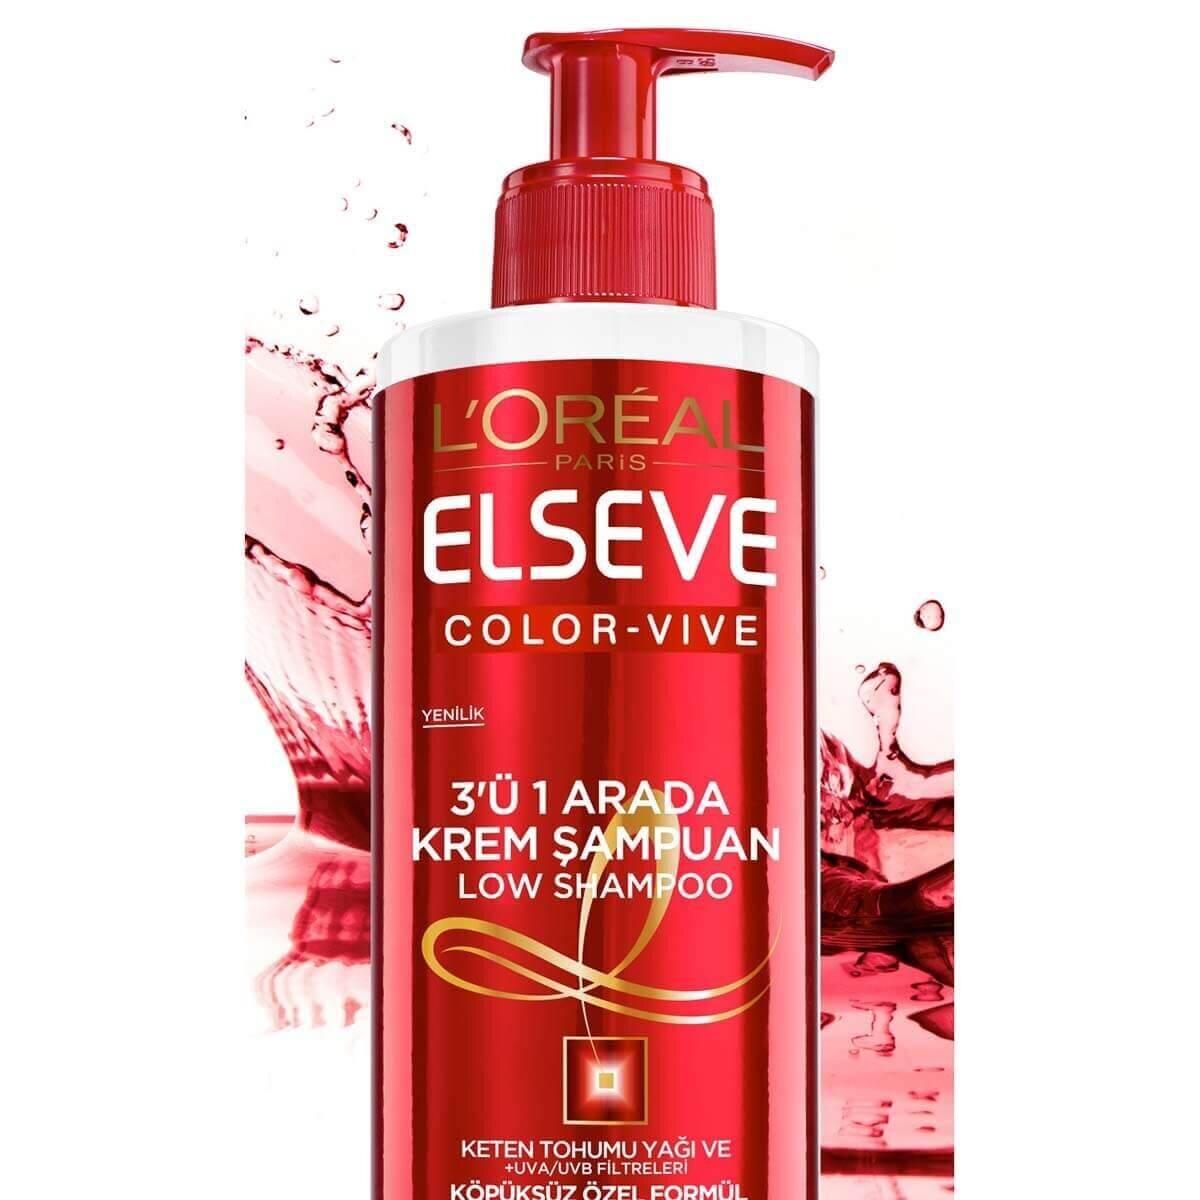 Color-Vive 3'ü 1 Arada Krem Şampuan